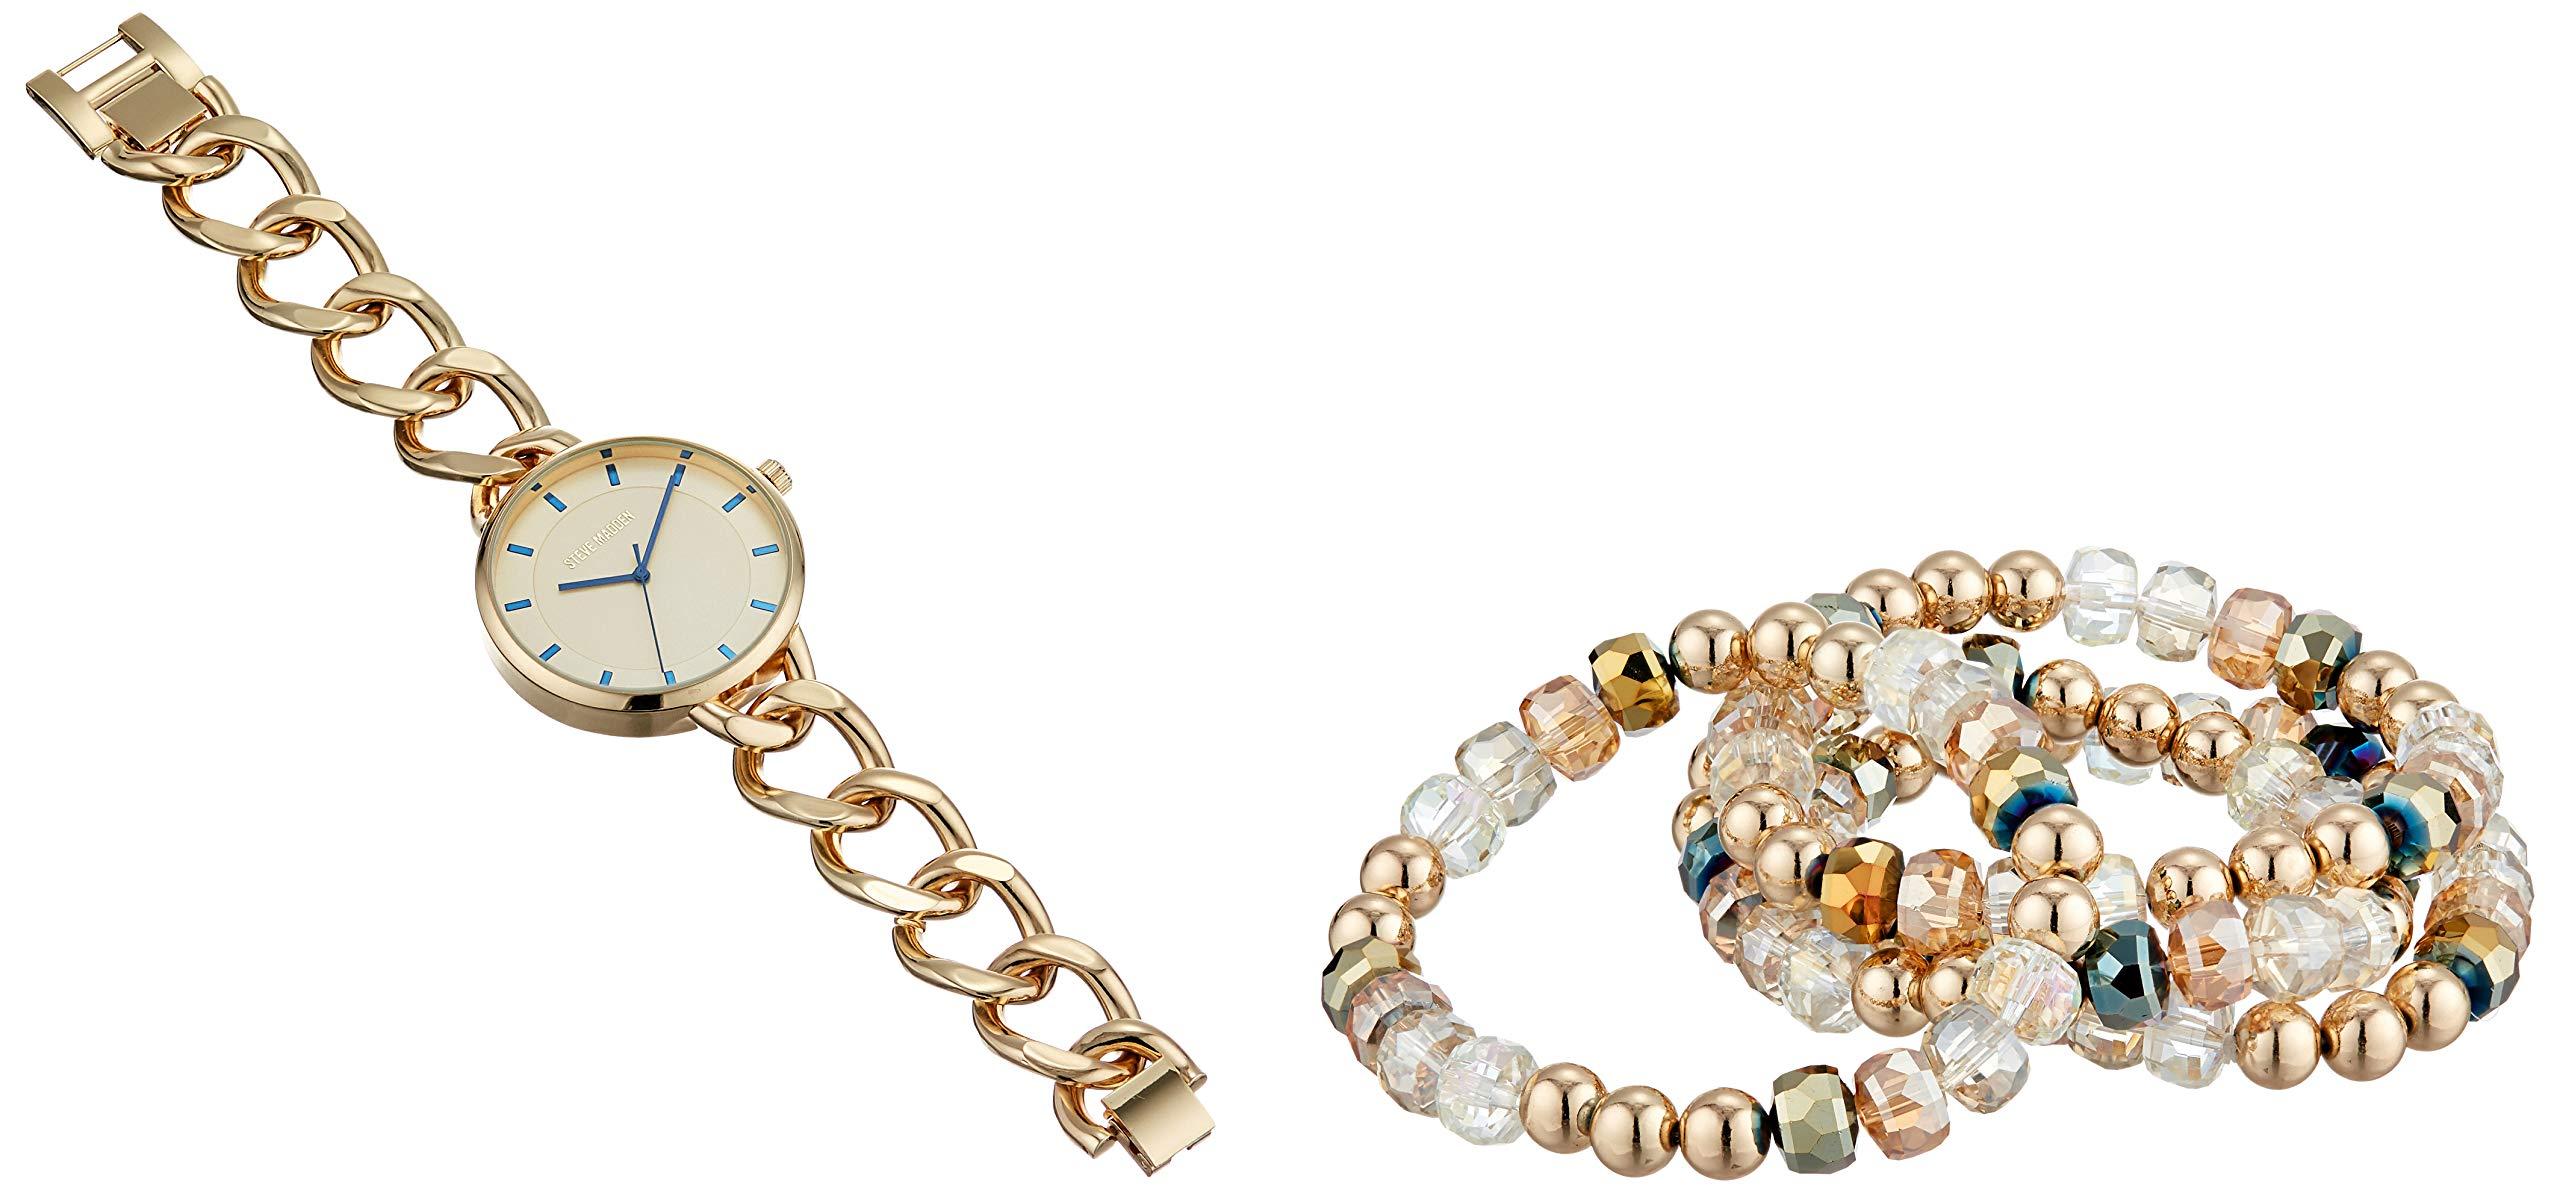 STEVE MADDEN Curb 链式手表多串珠弹力手链套装(多种颜色)